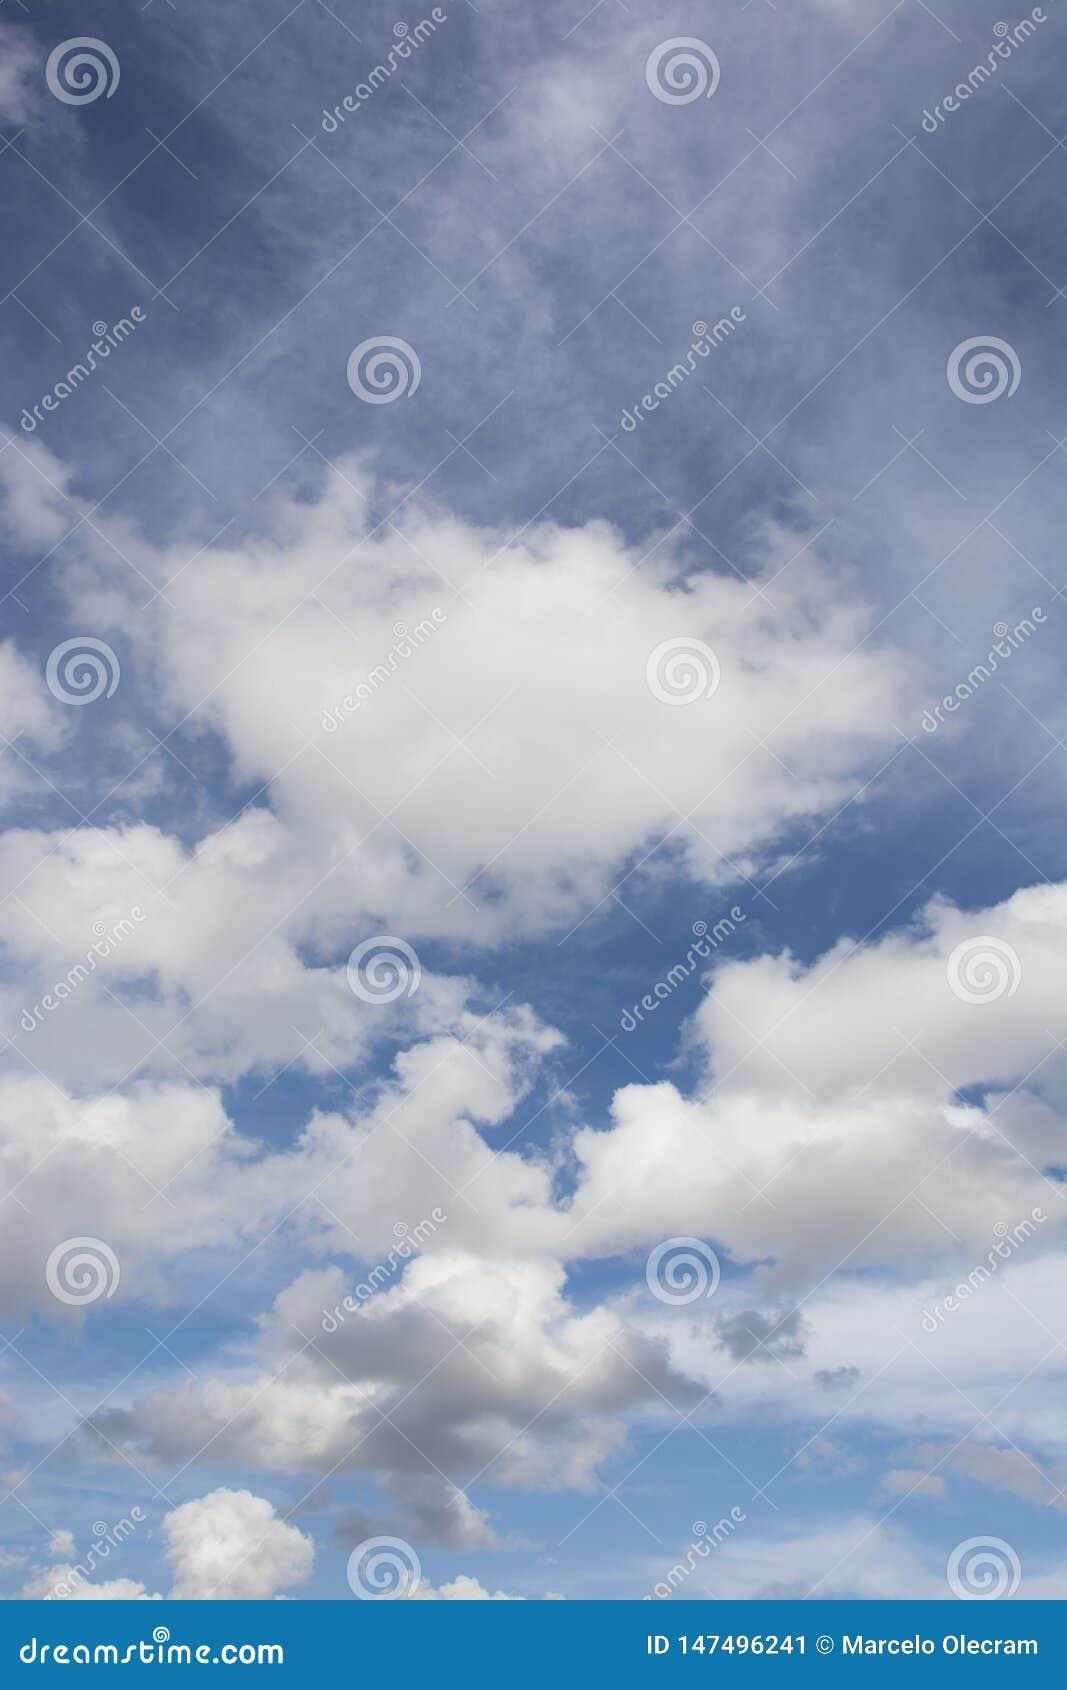 A beautiful sky and clouds scene.